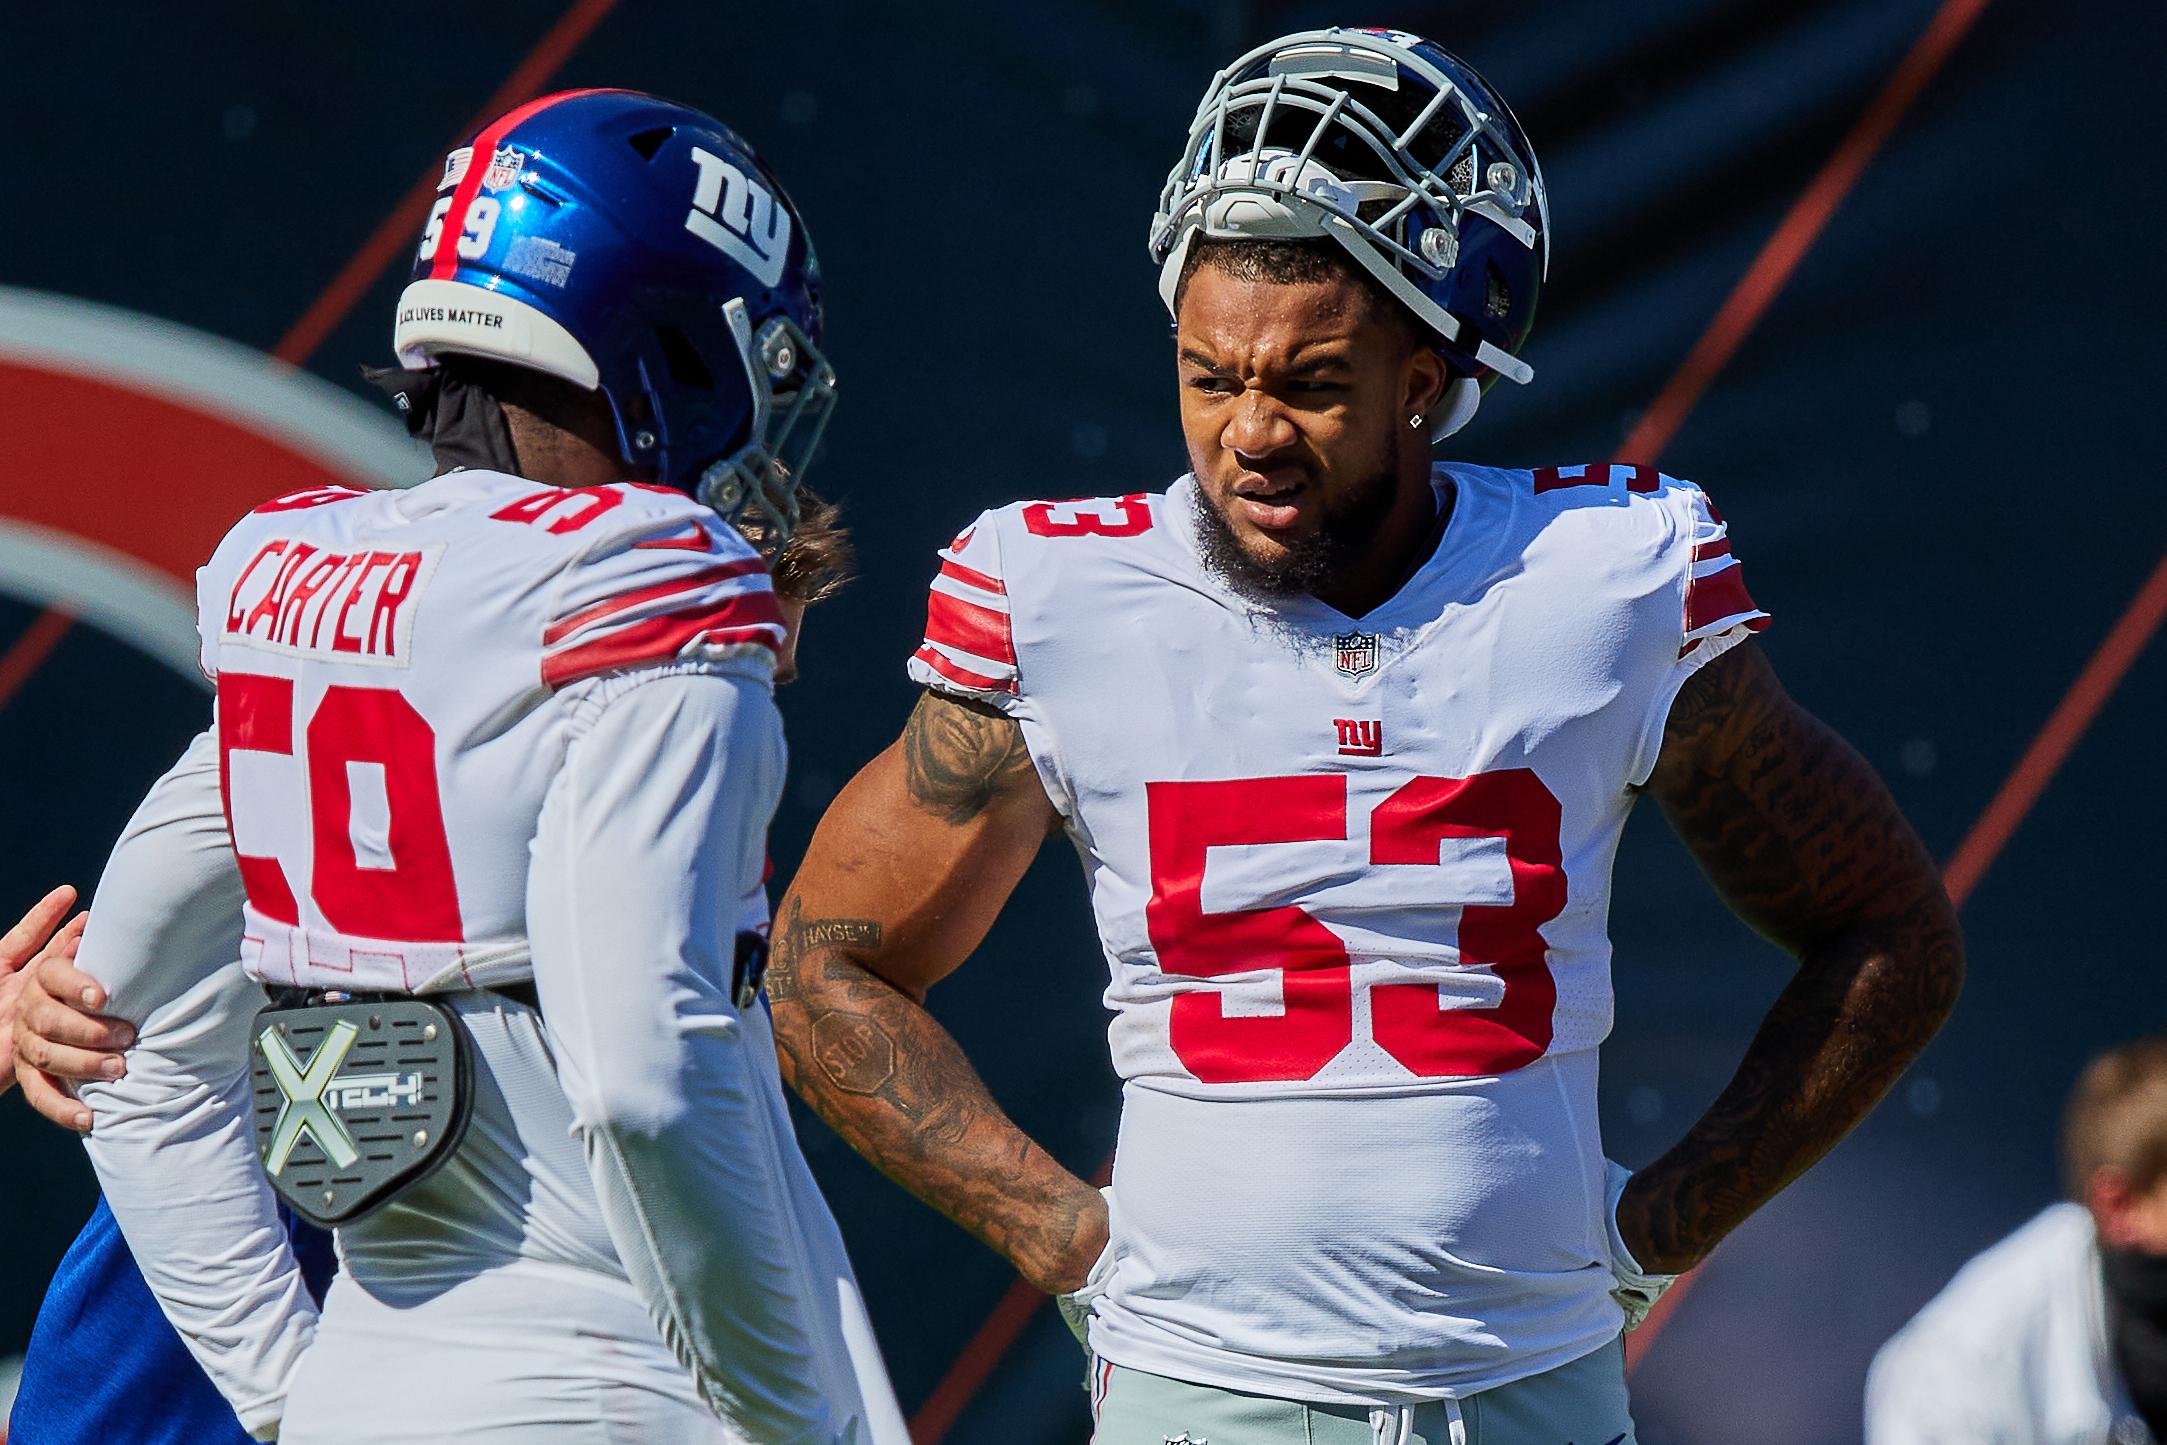 NFL: SEP 20 Giants at Bears